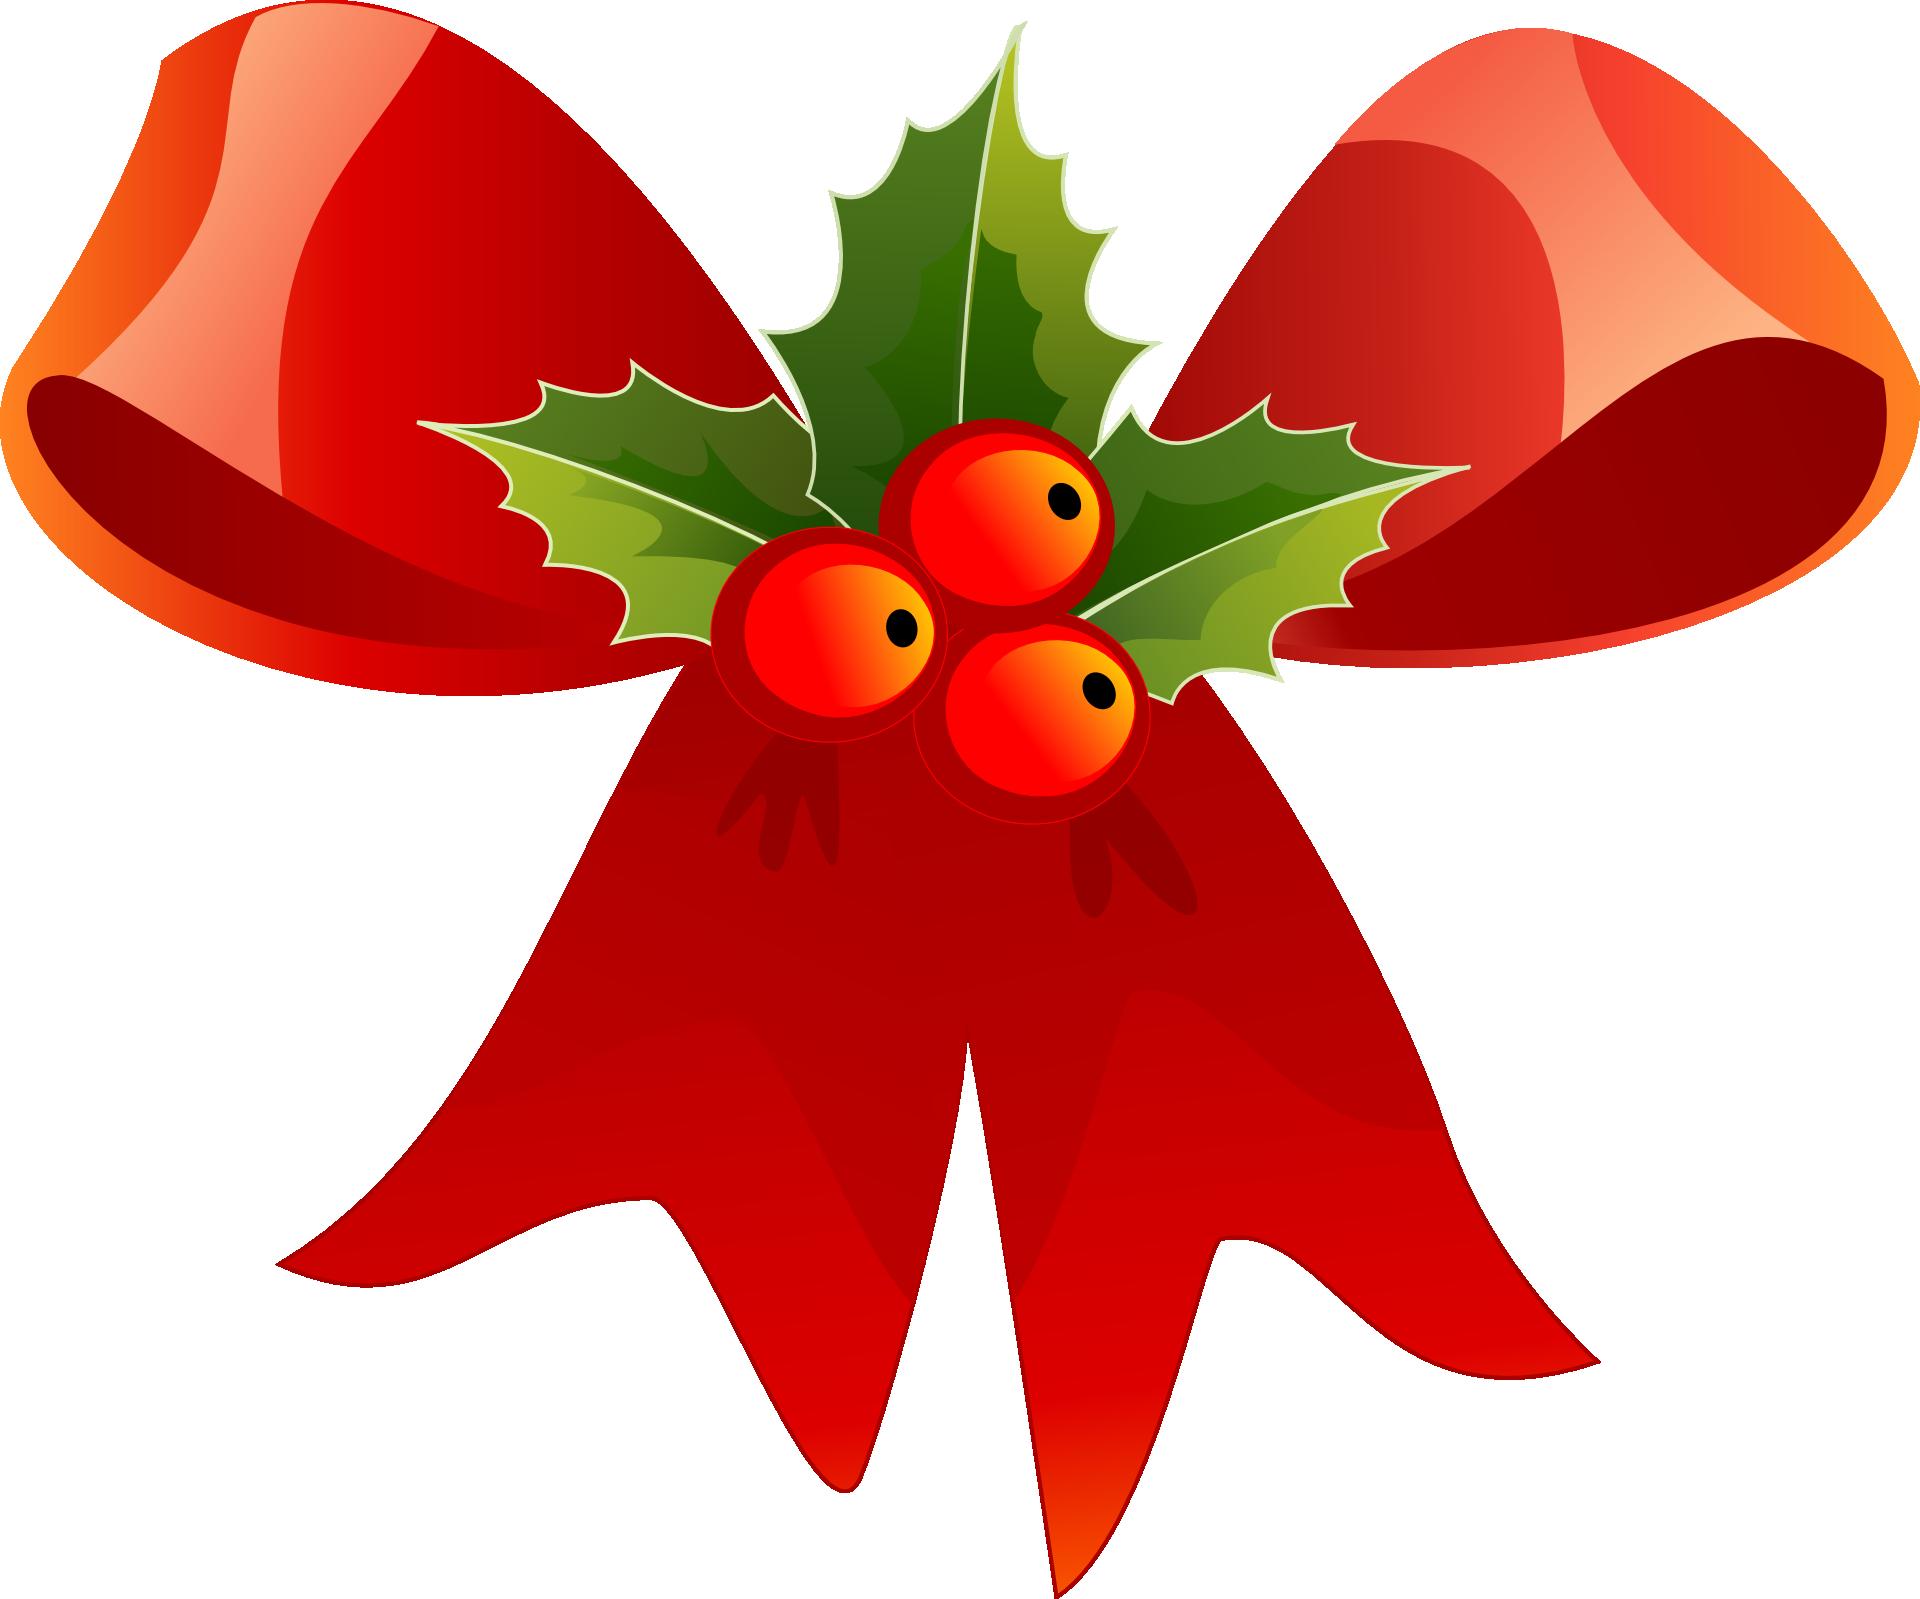 Christmas fish clipart image royalty free Presentations | Fish Pool image royalty free